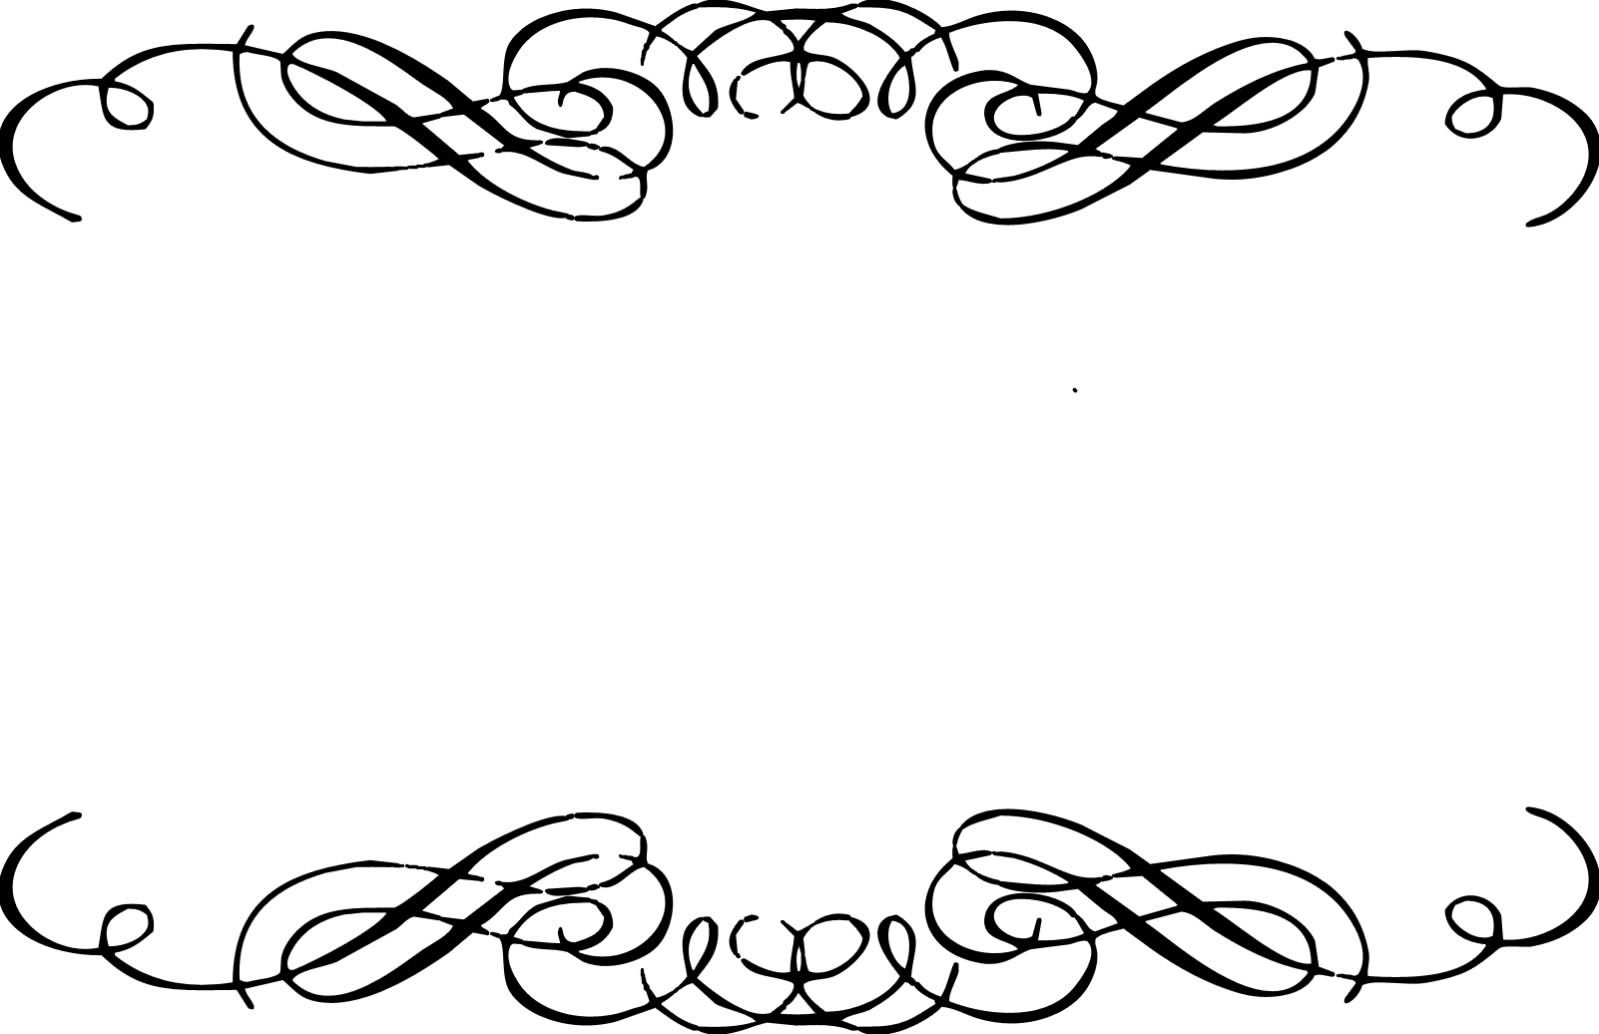 Wedding Swirls The Wedding Calligraphy Swirls Collection